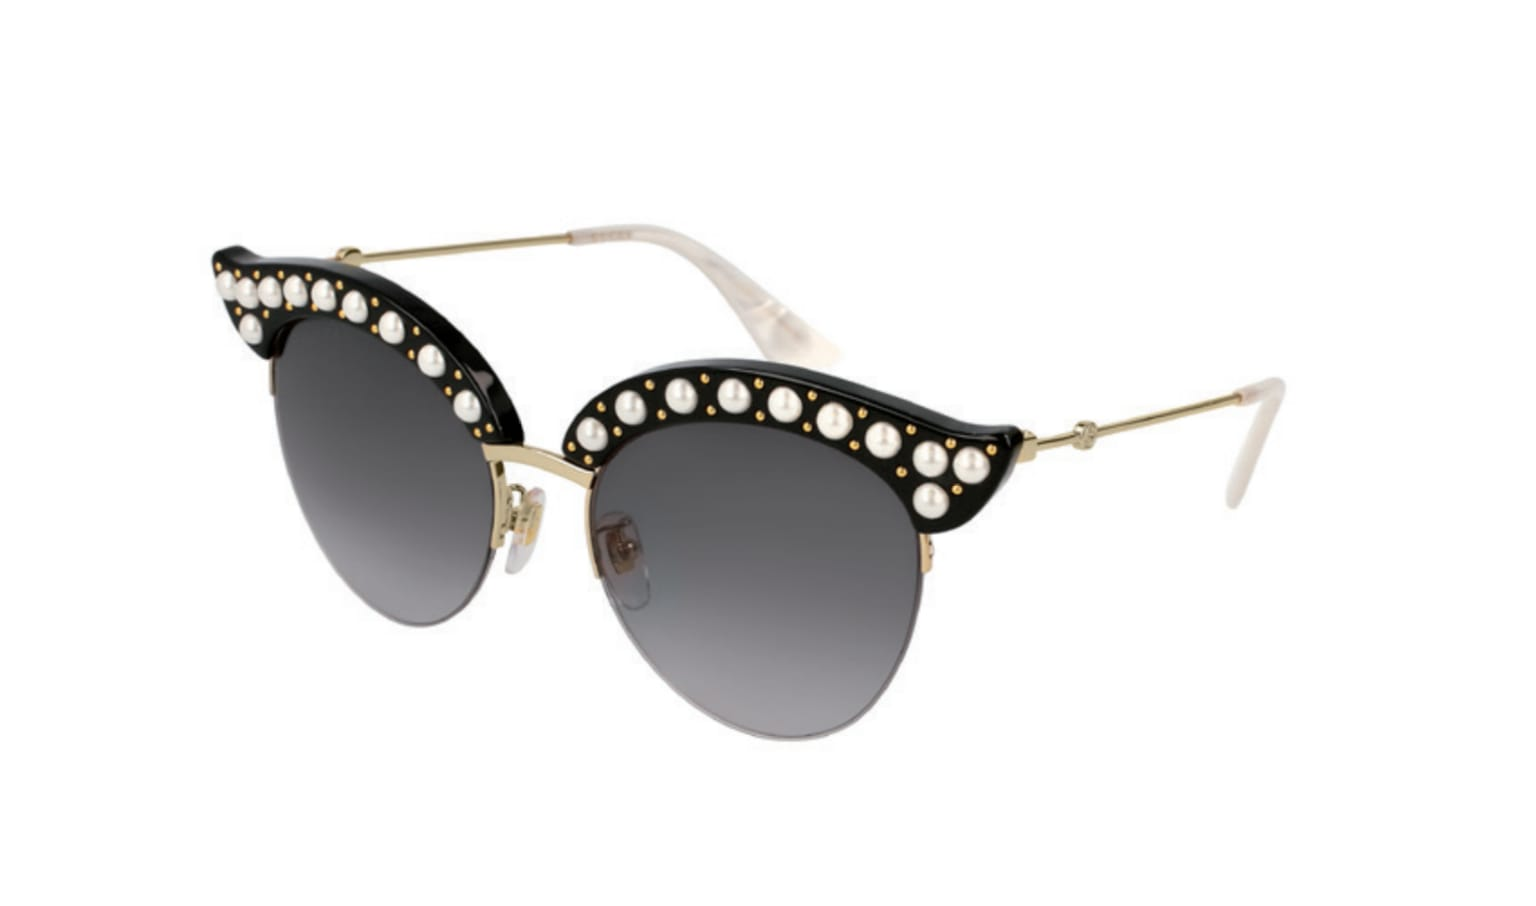 8 Kacamata Wanita Terbaru dari Koleksi Gucci-media-4 - 103.8 FM ... acef2c426a